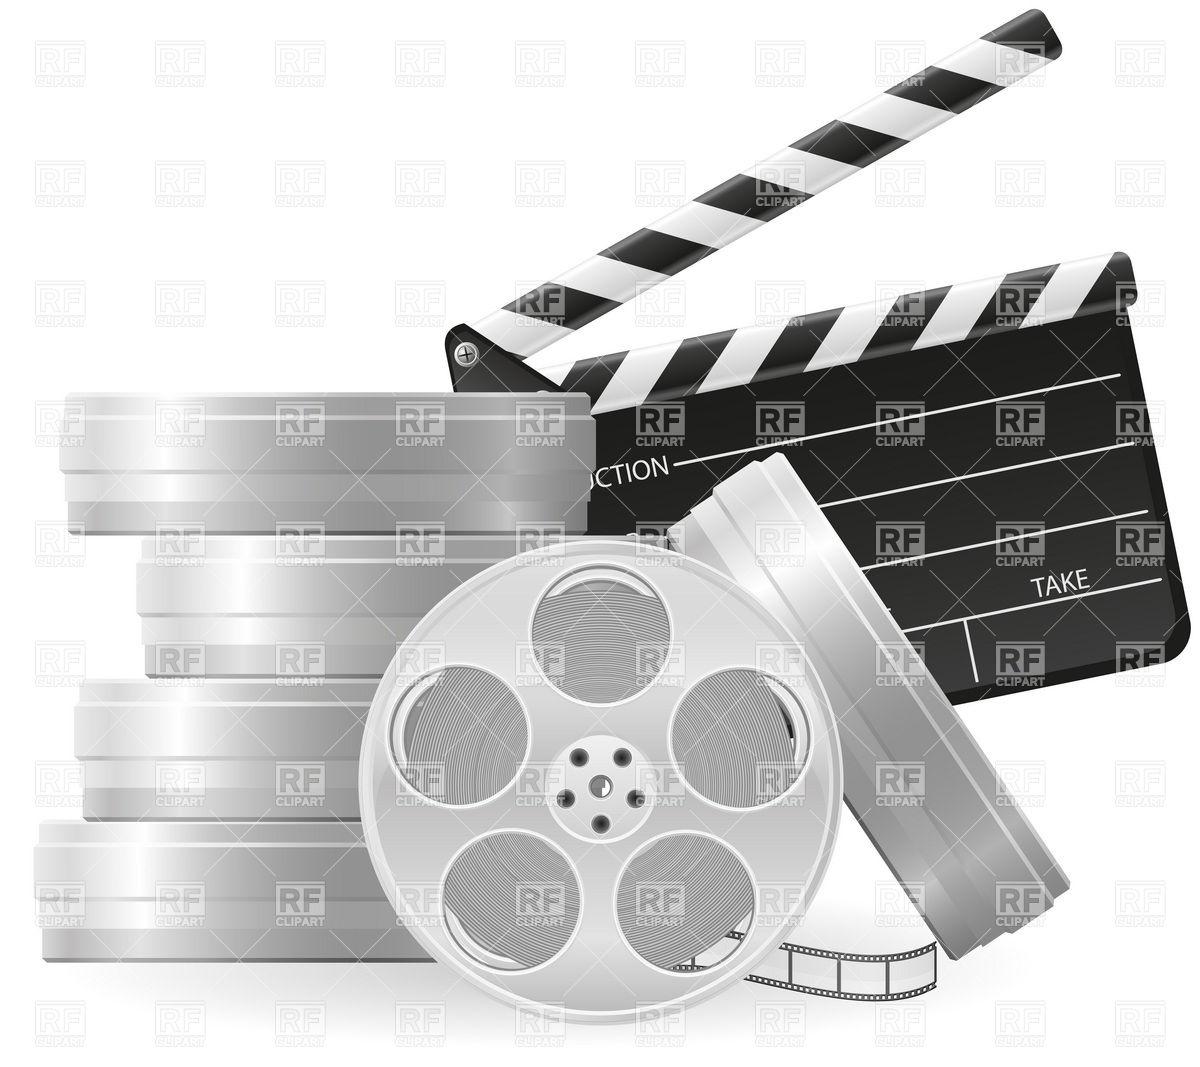 1200x1067 Cinematography, Cinema And Movie Symbols